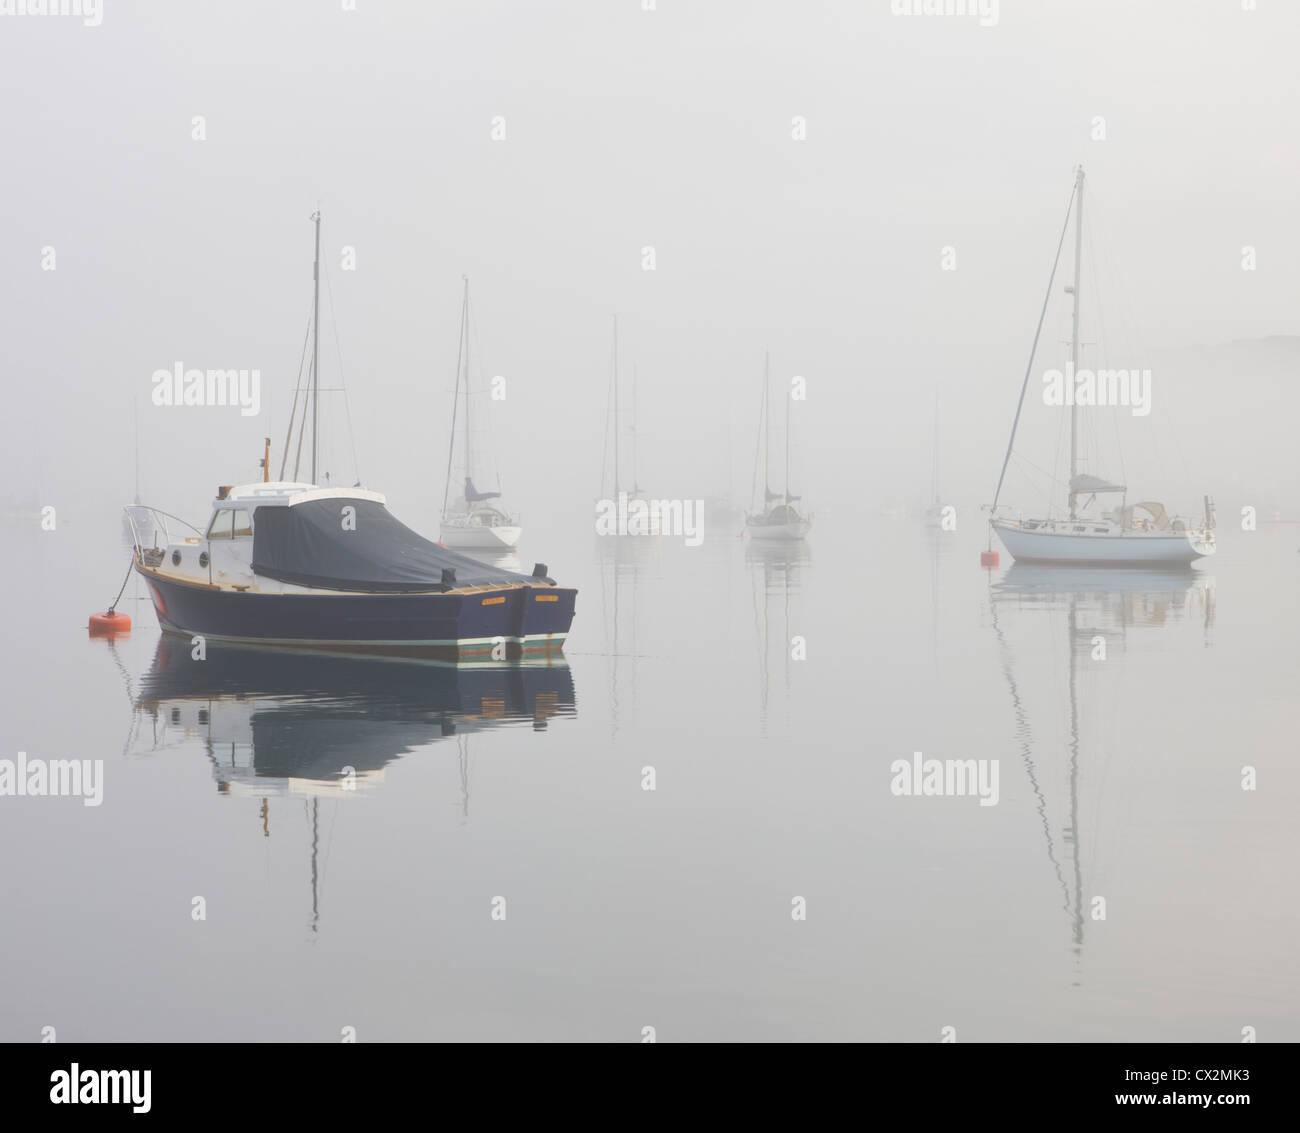 Boats in the mist on Kingsbridge Estuary, Salcombe, South Hams, Devon, England. Autumn (September) 2010. - Stock Image